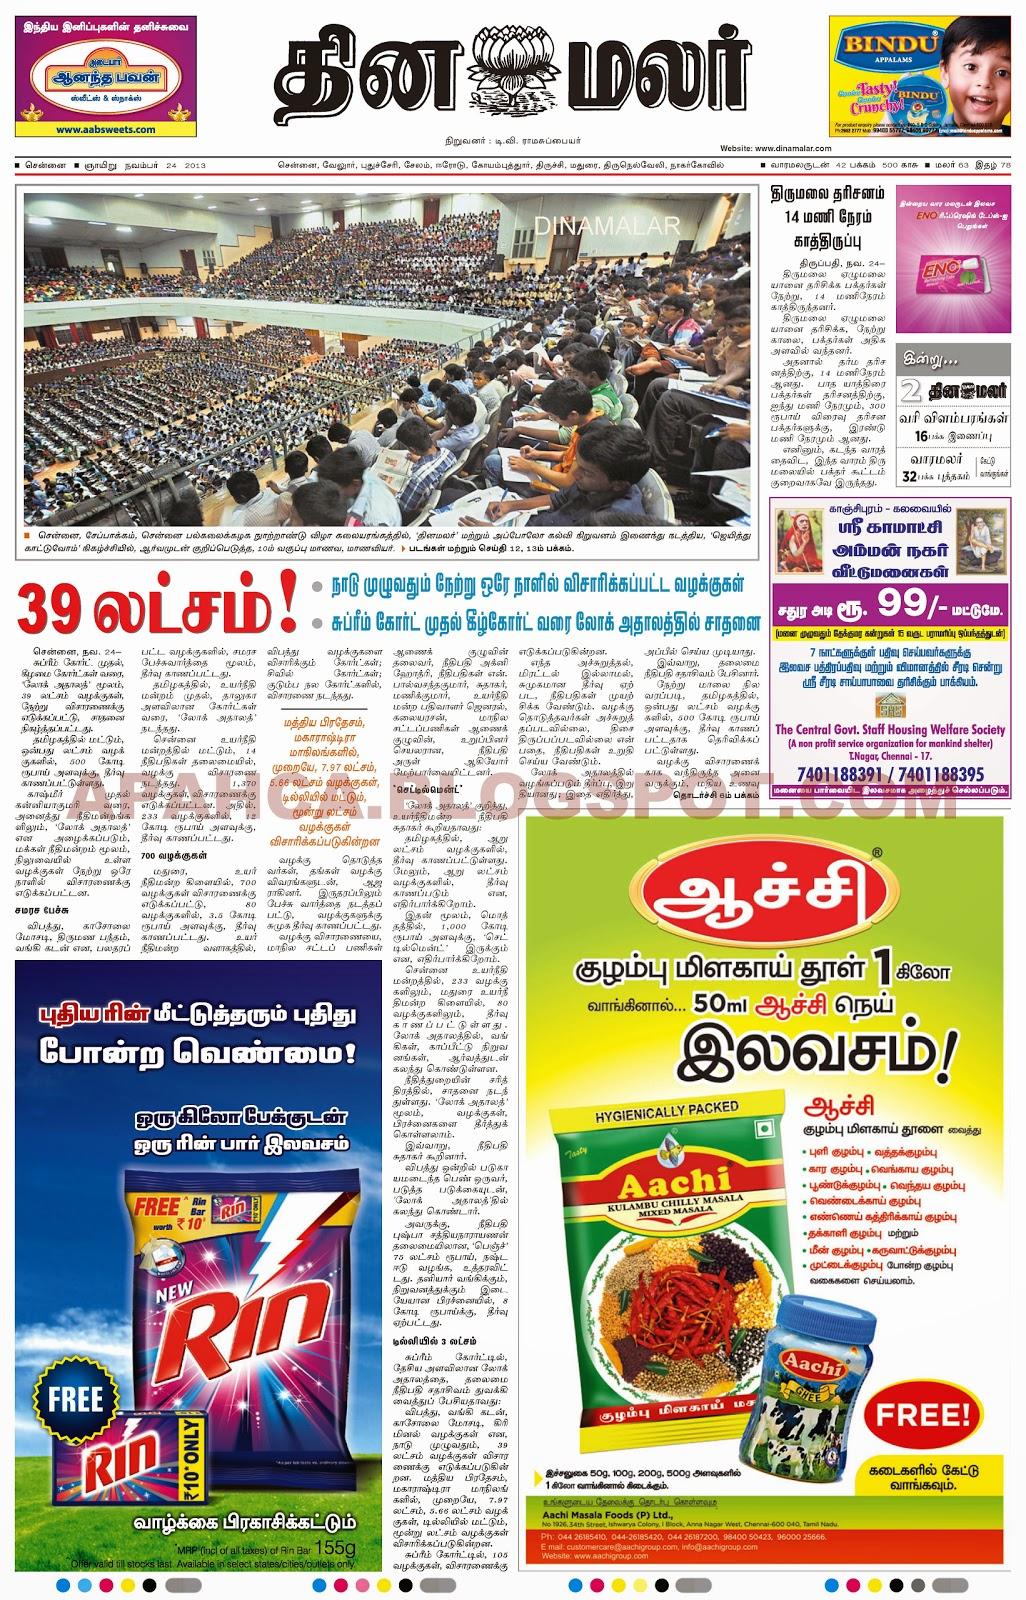 Tamil Nadu Newspapers | Tamil Nadu Newspapers Newspaper